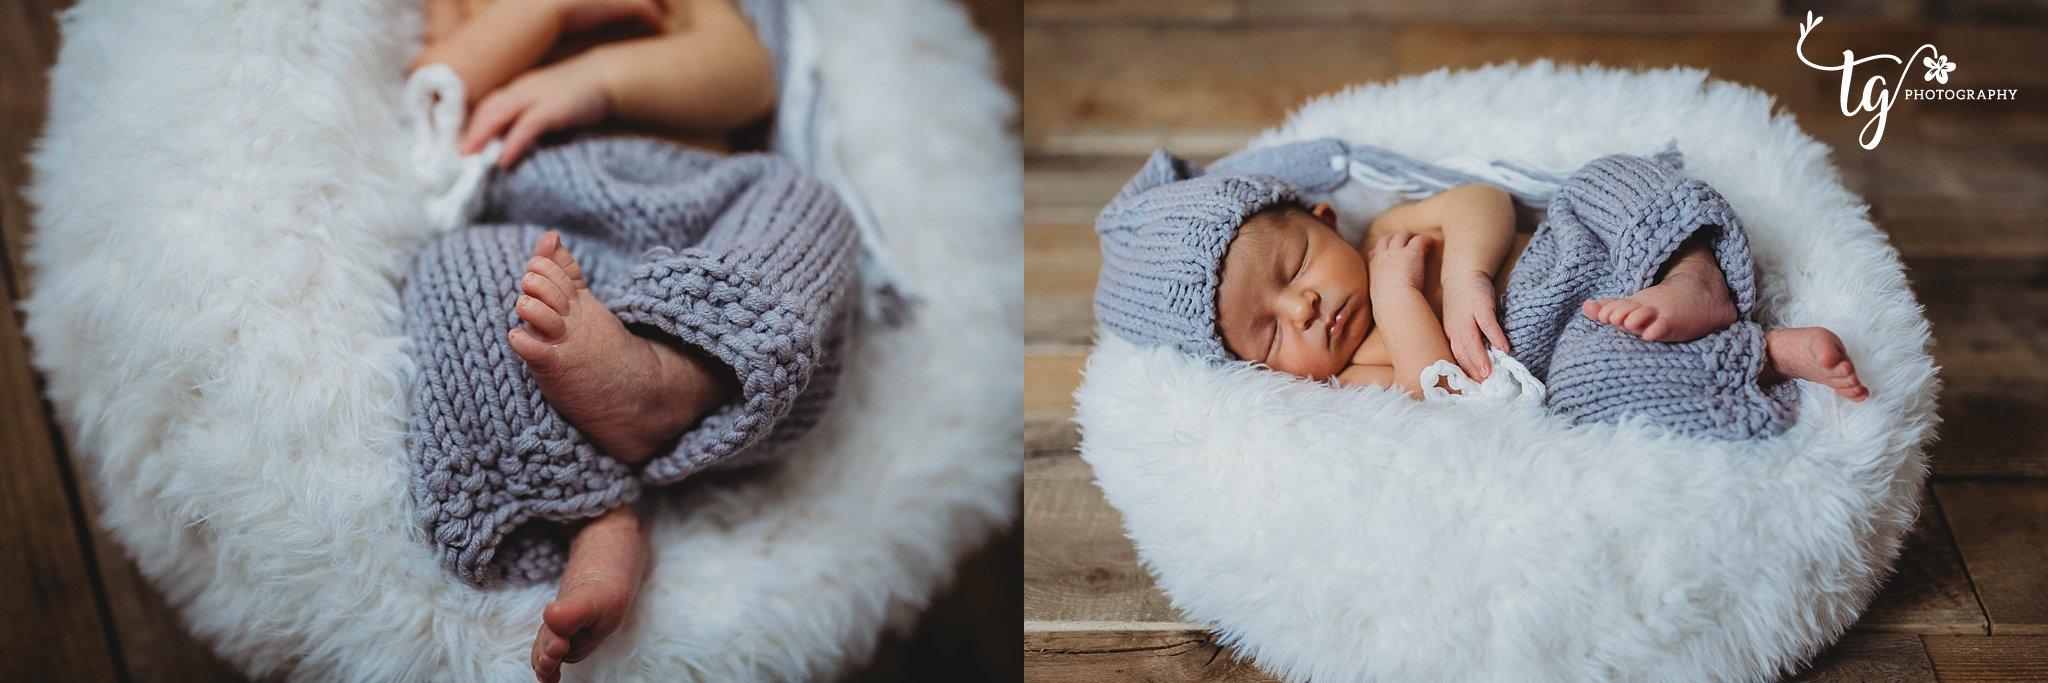 wood backdrop studio newborn photography